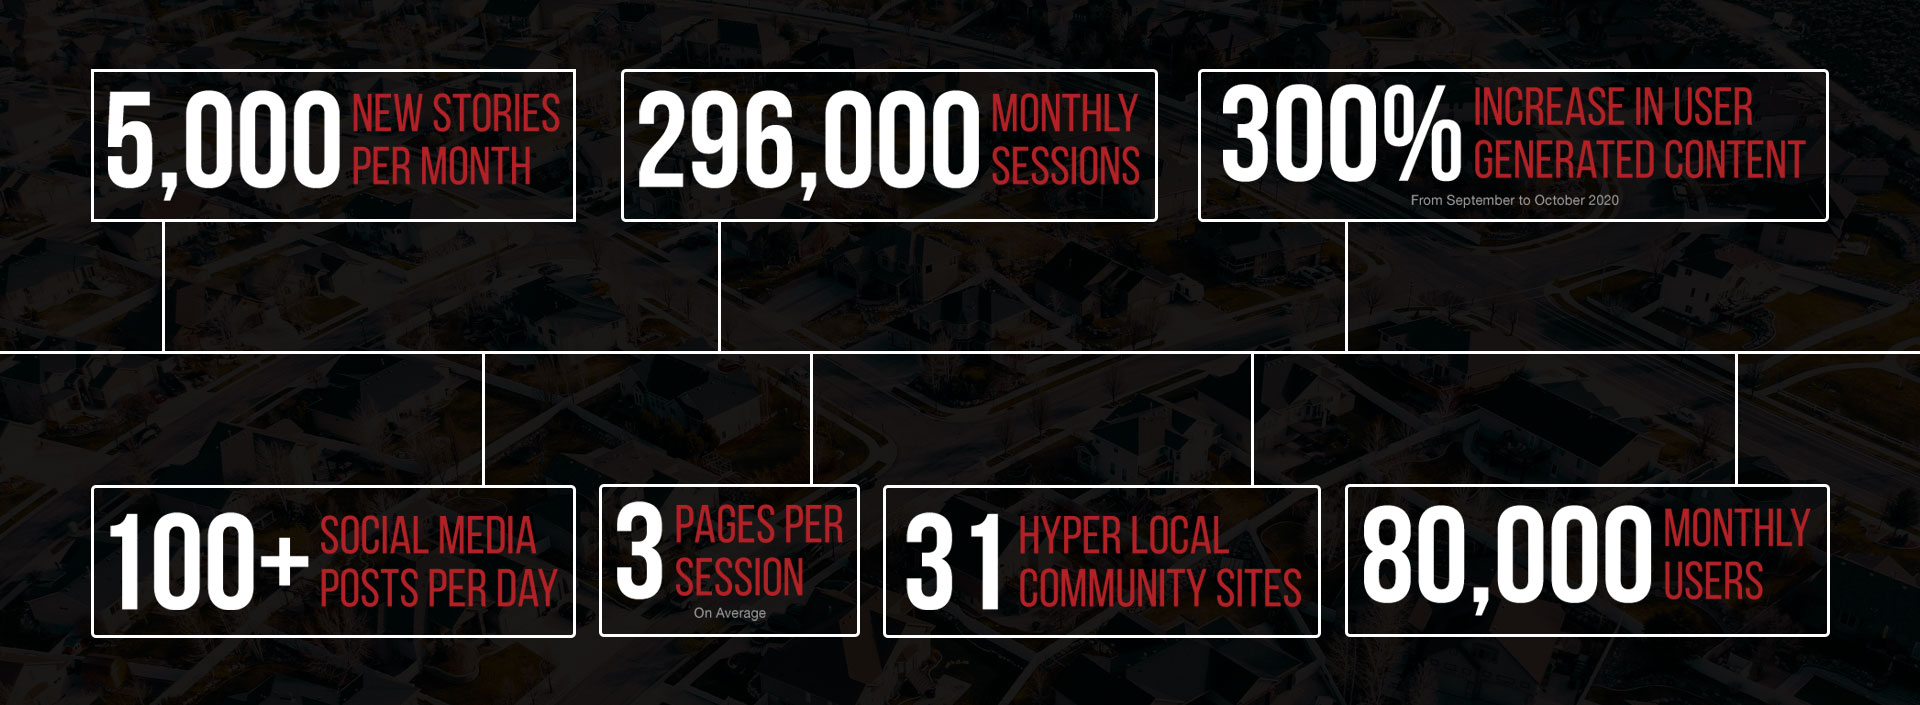 NNN Statistics Infographic